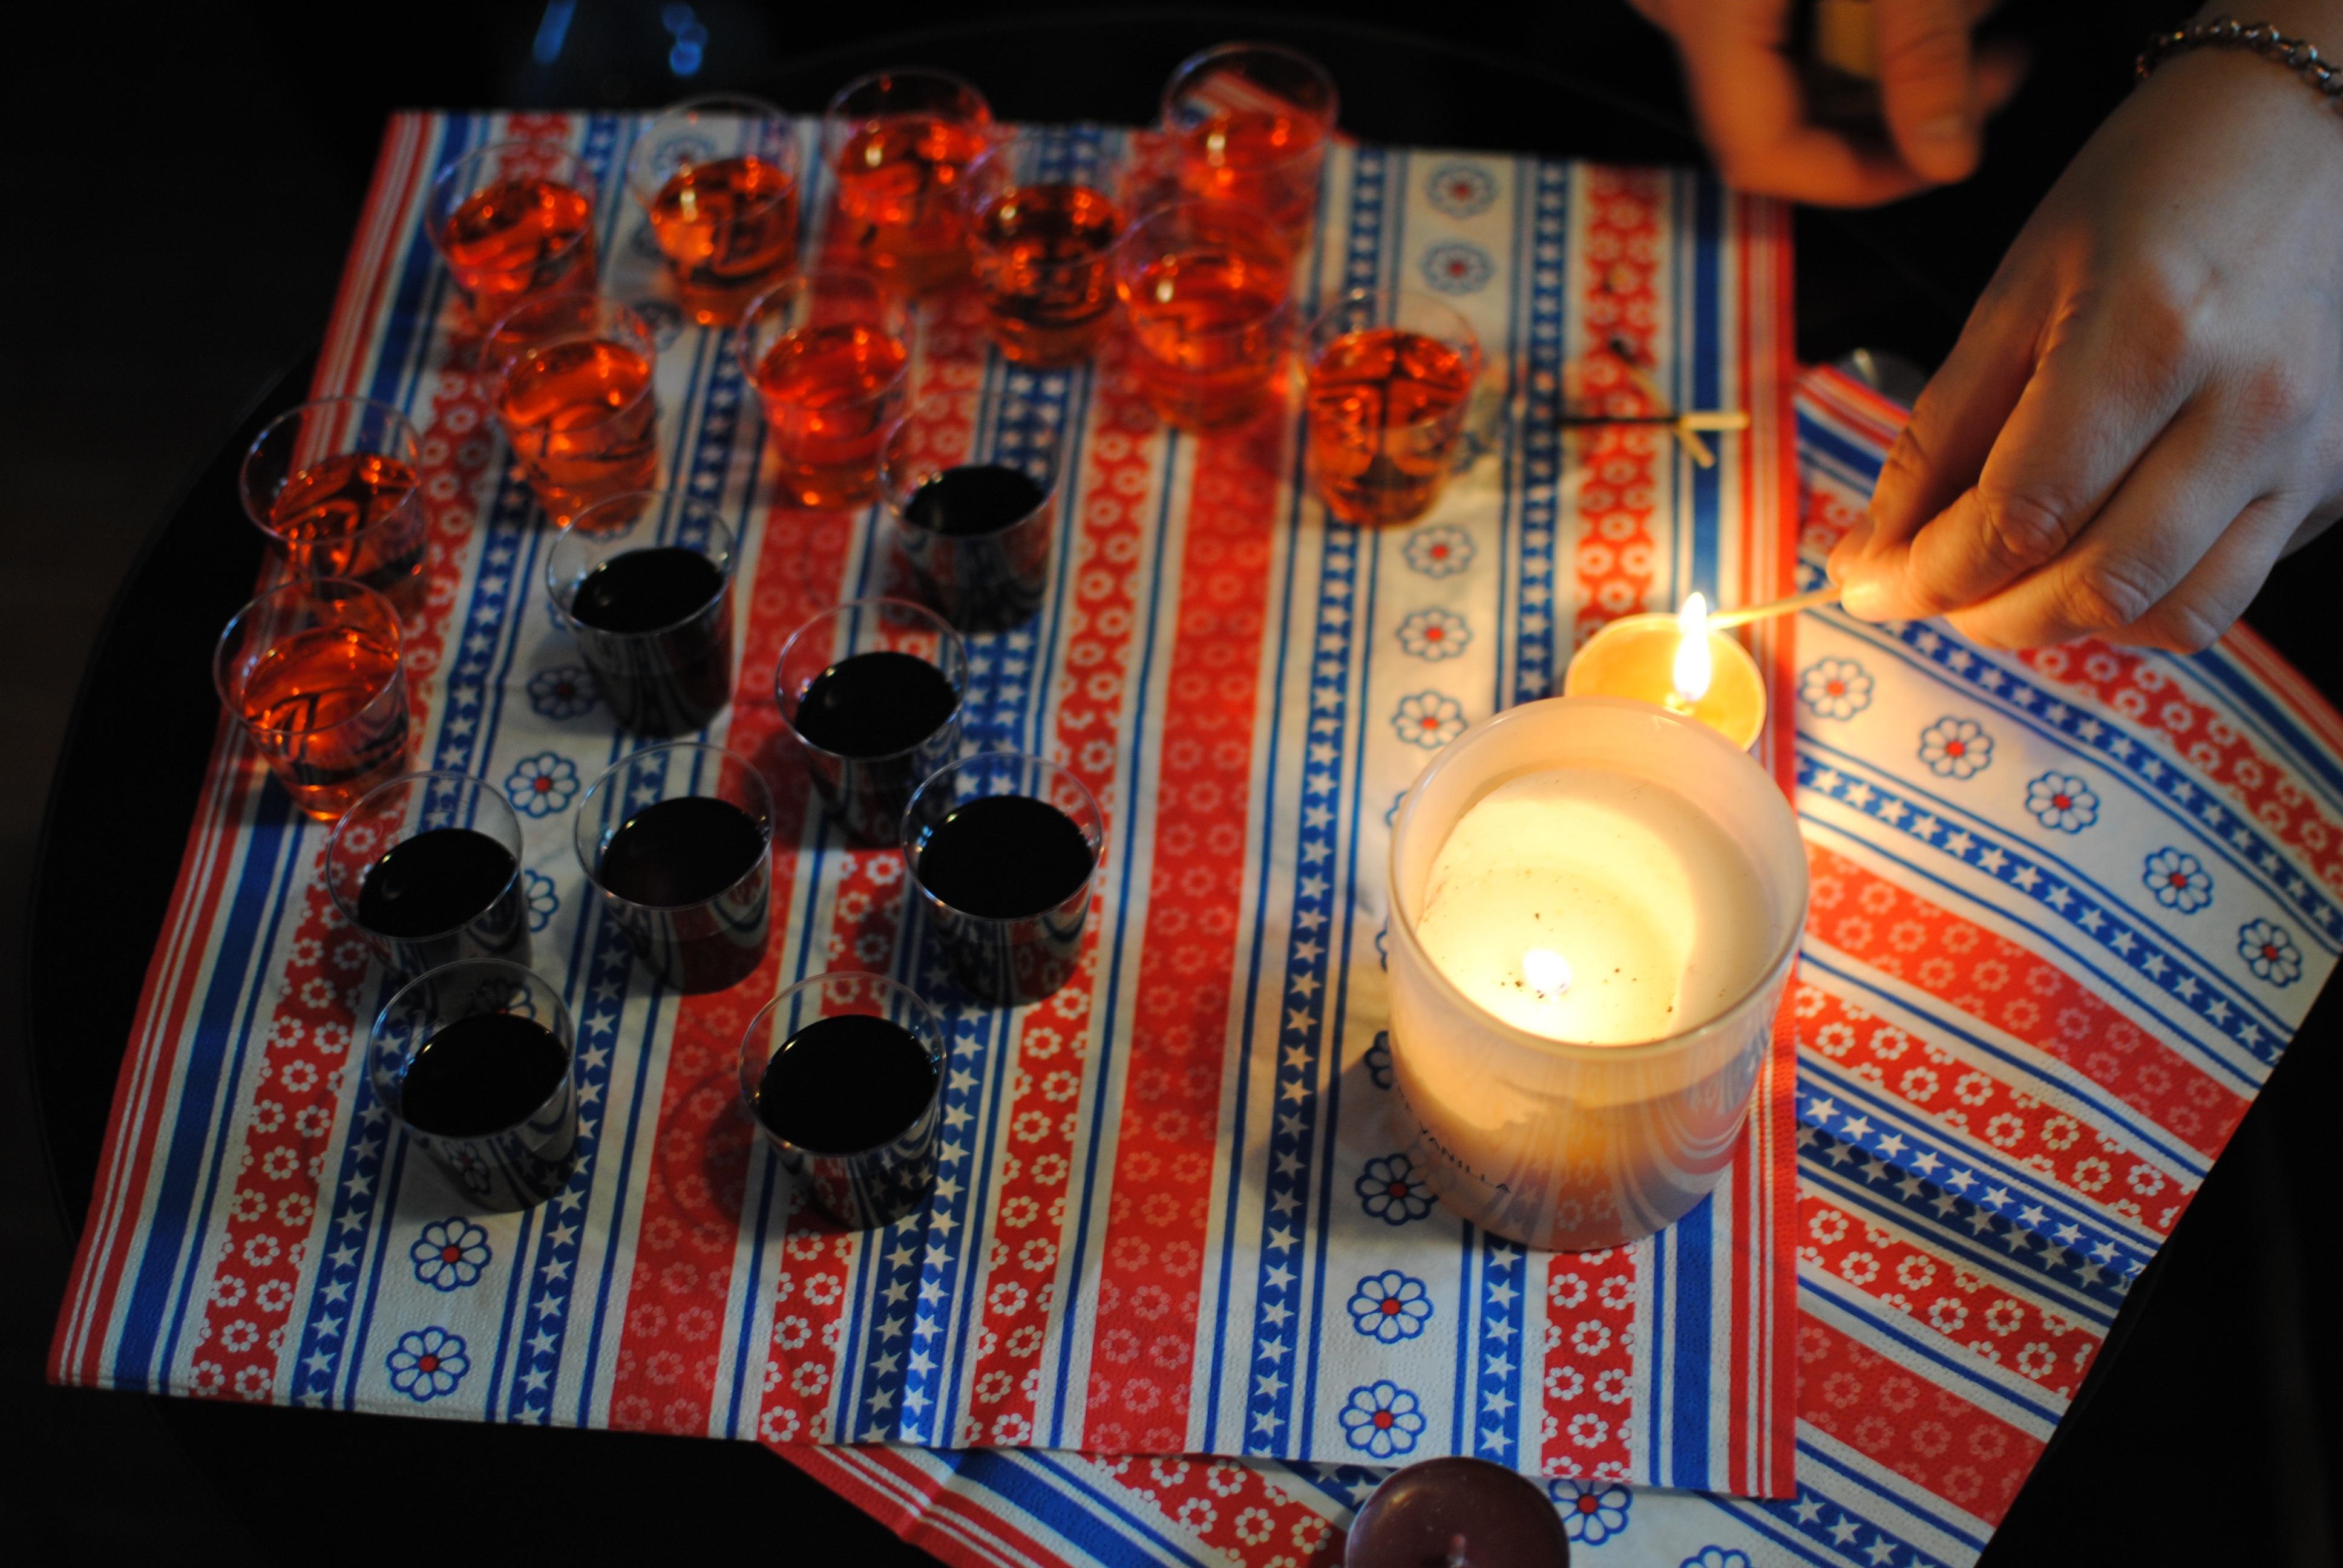 Kostenlose foto : Nacht-, Gitarre, Jung, Getränk, Nachtleben, Kerze ...